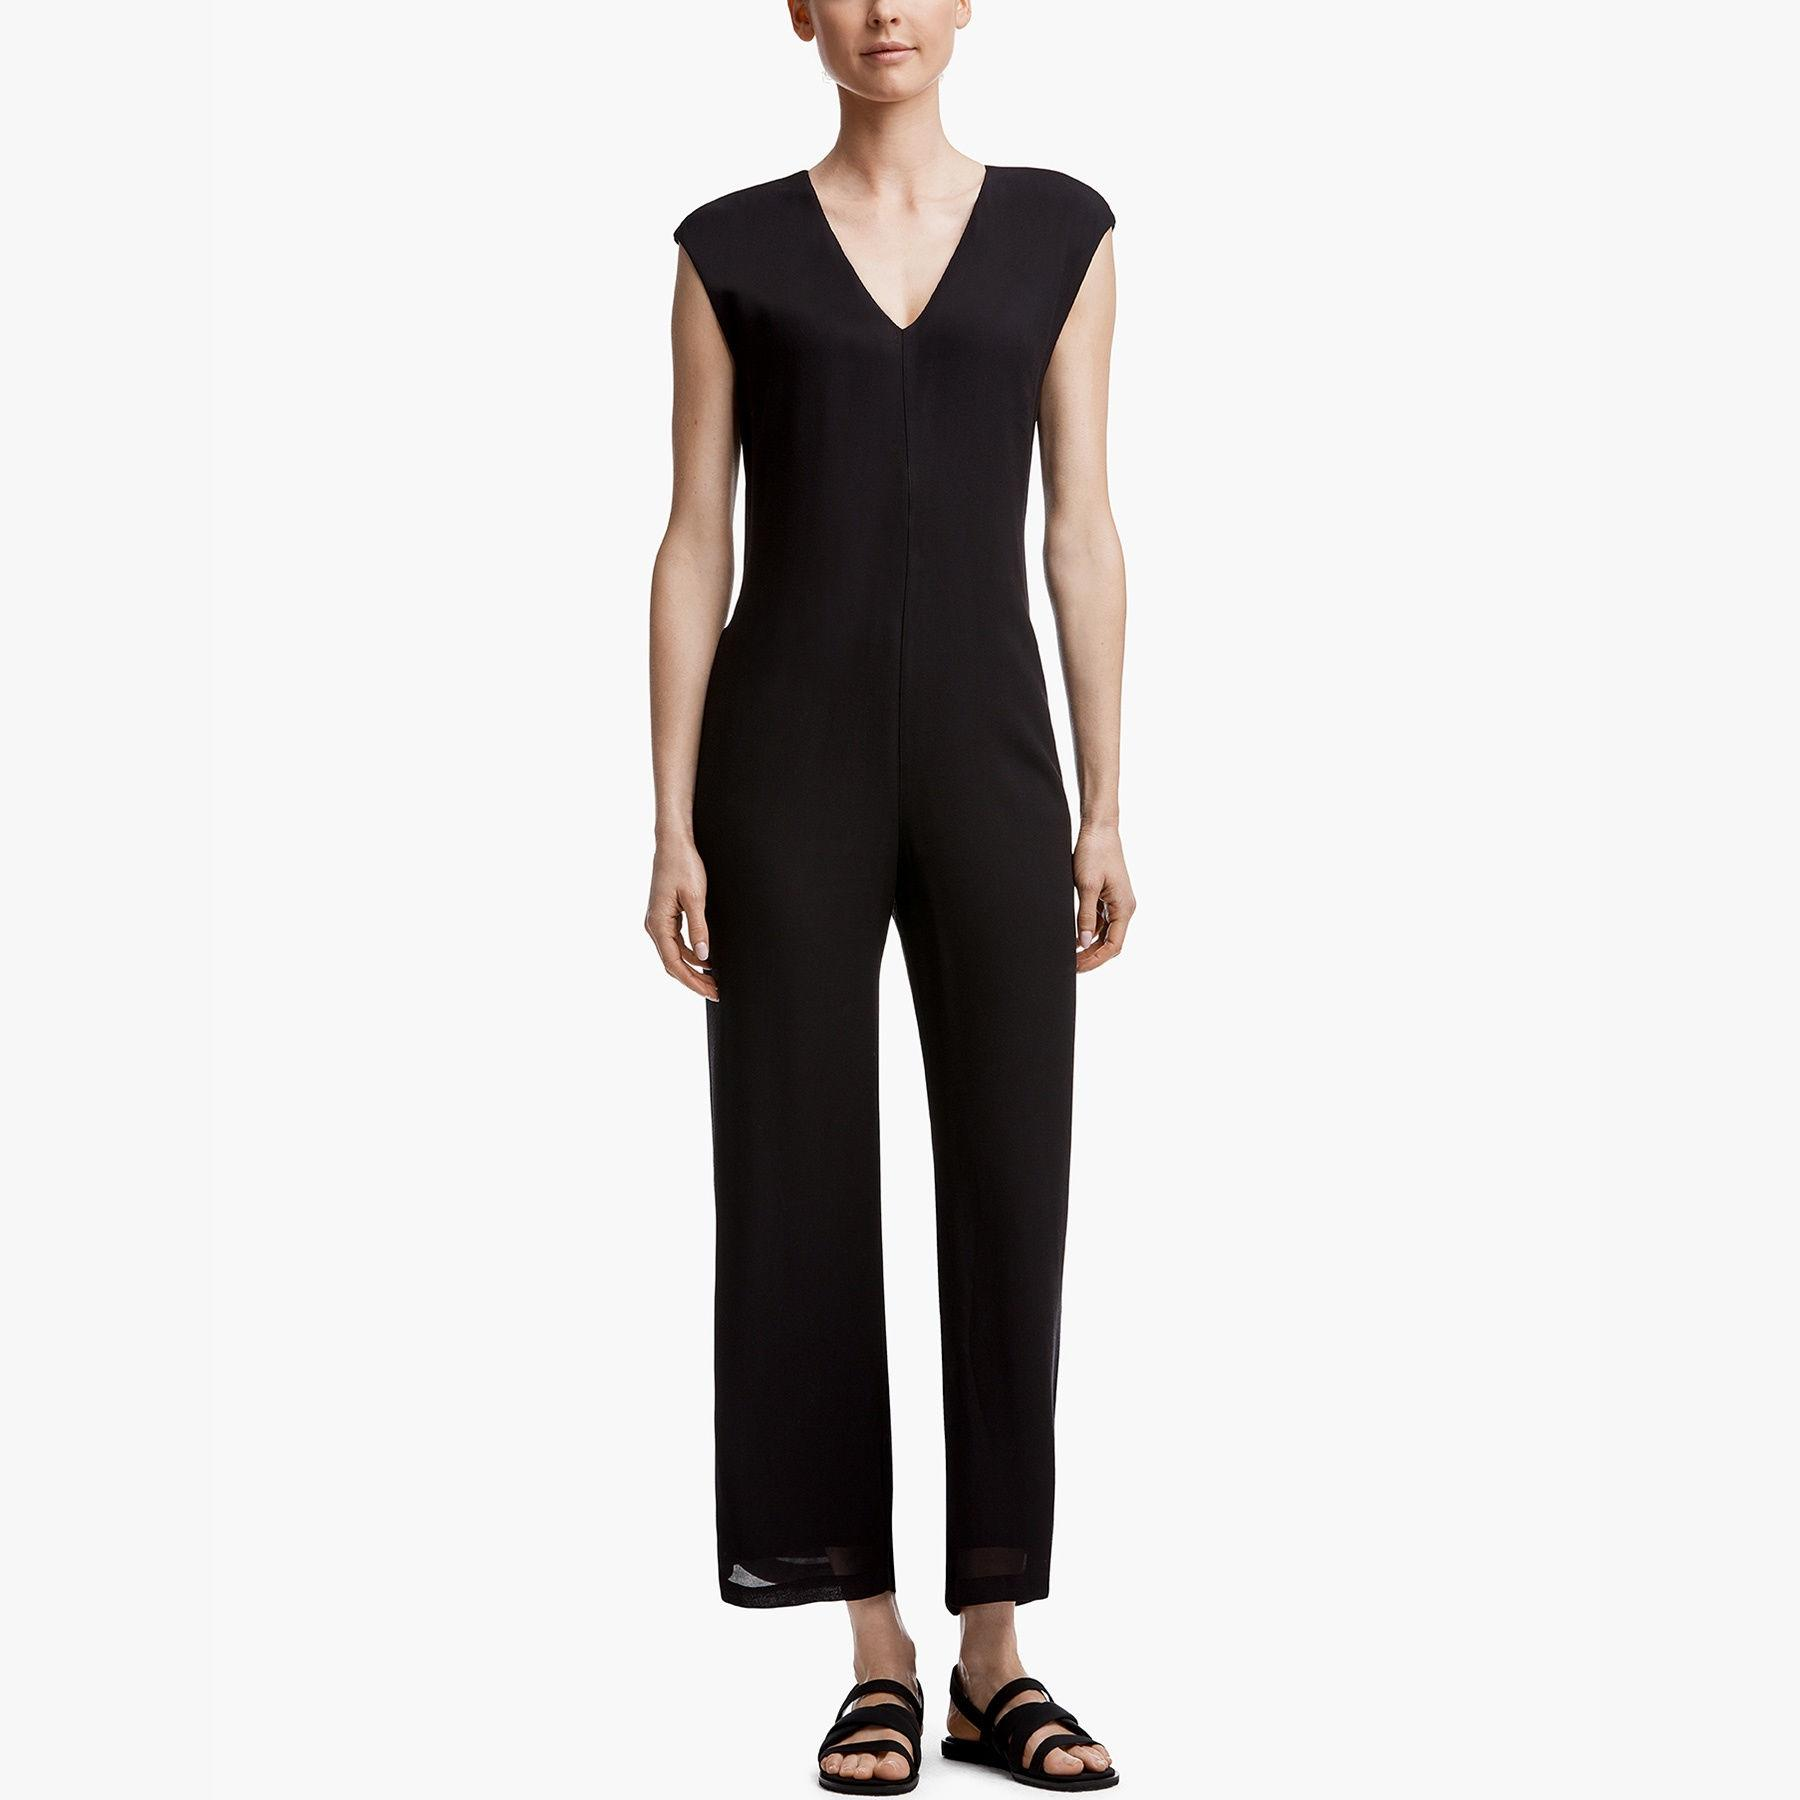 bf2404c003f Lyst - James Perse Soft V-neck Jumpsuit in Black